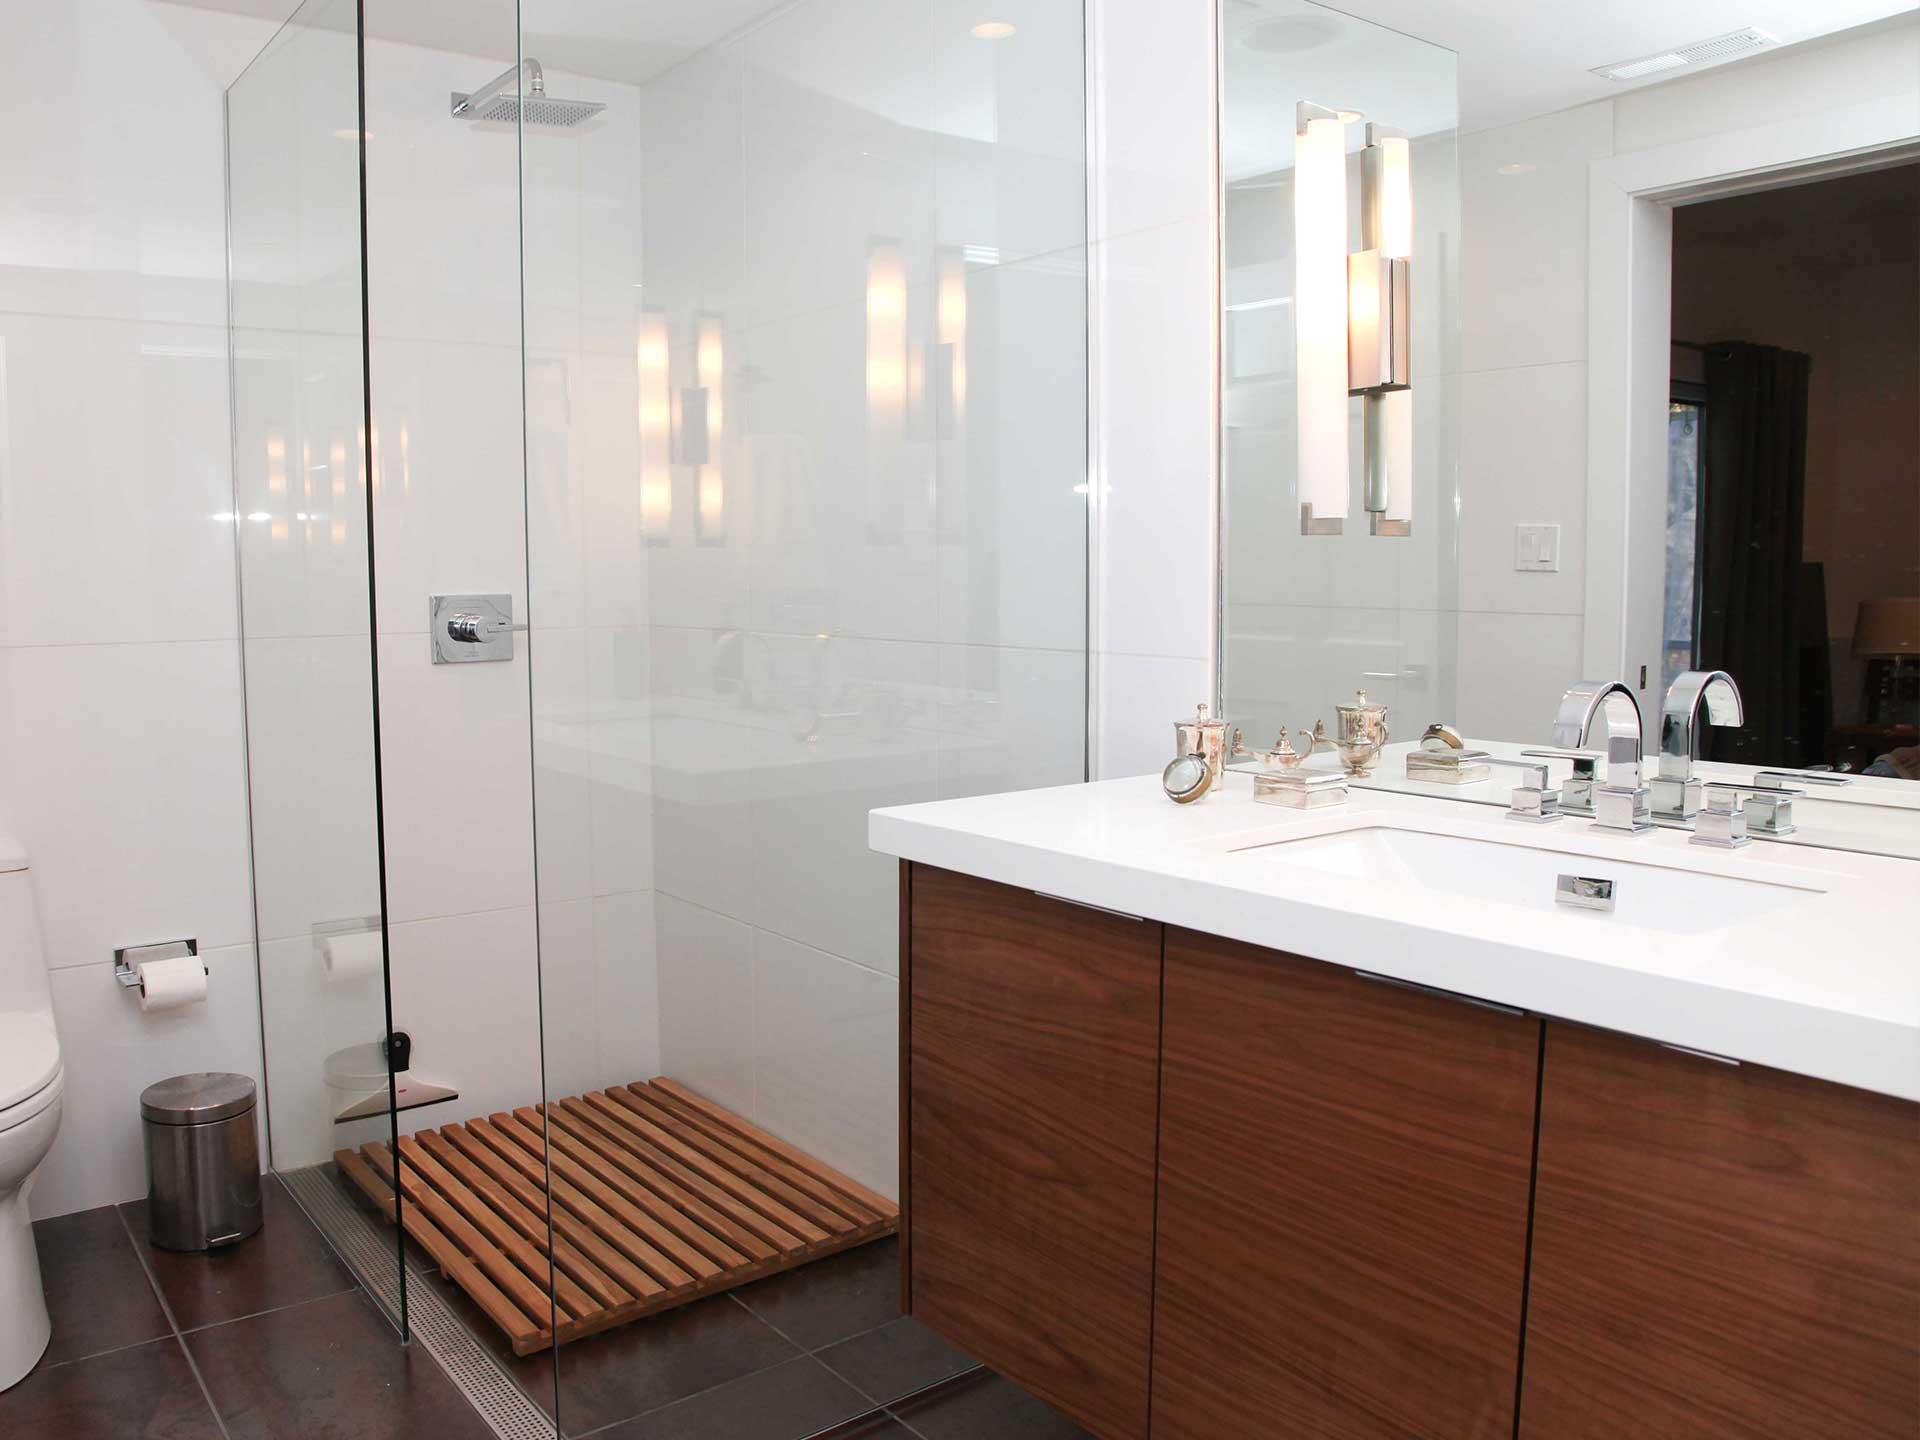 midwest-remodeling-bathroom-remodel-2